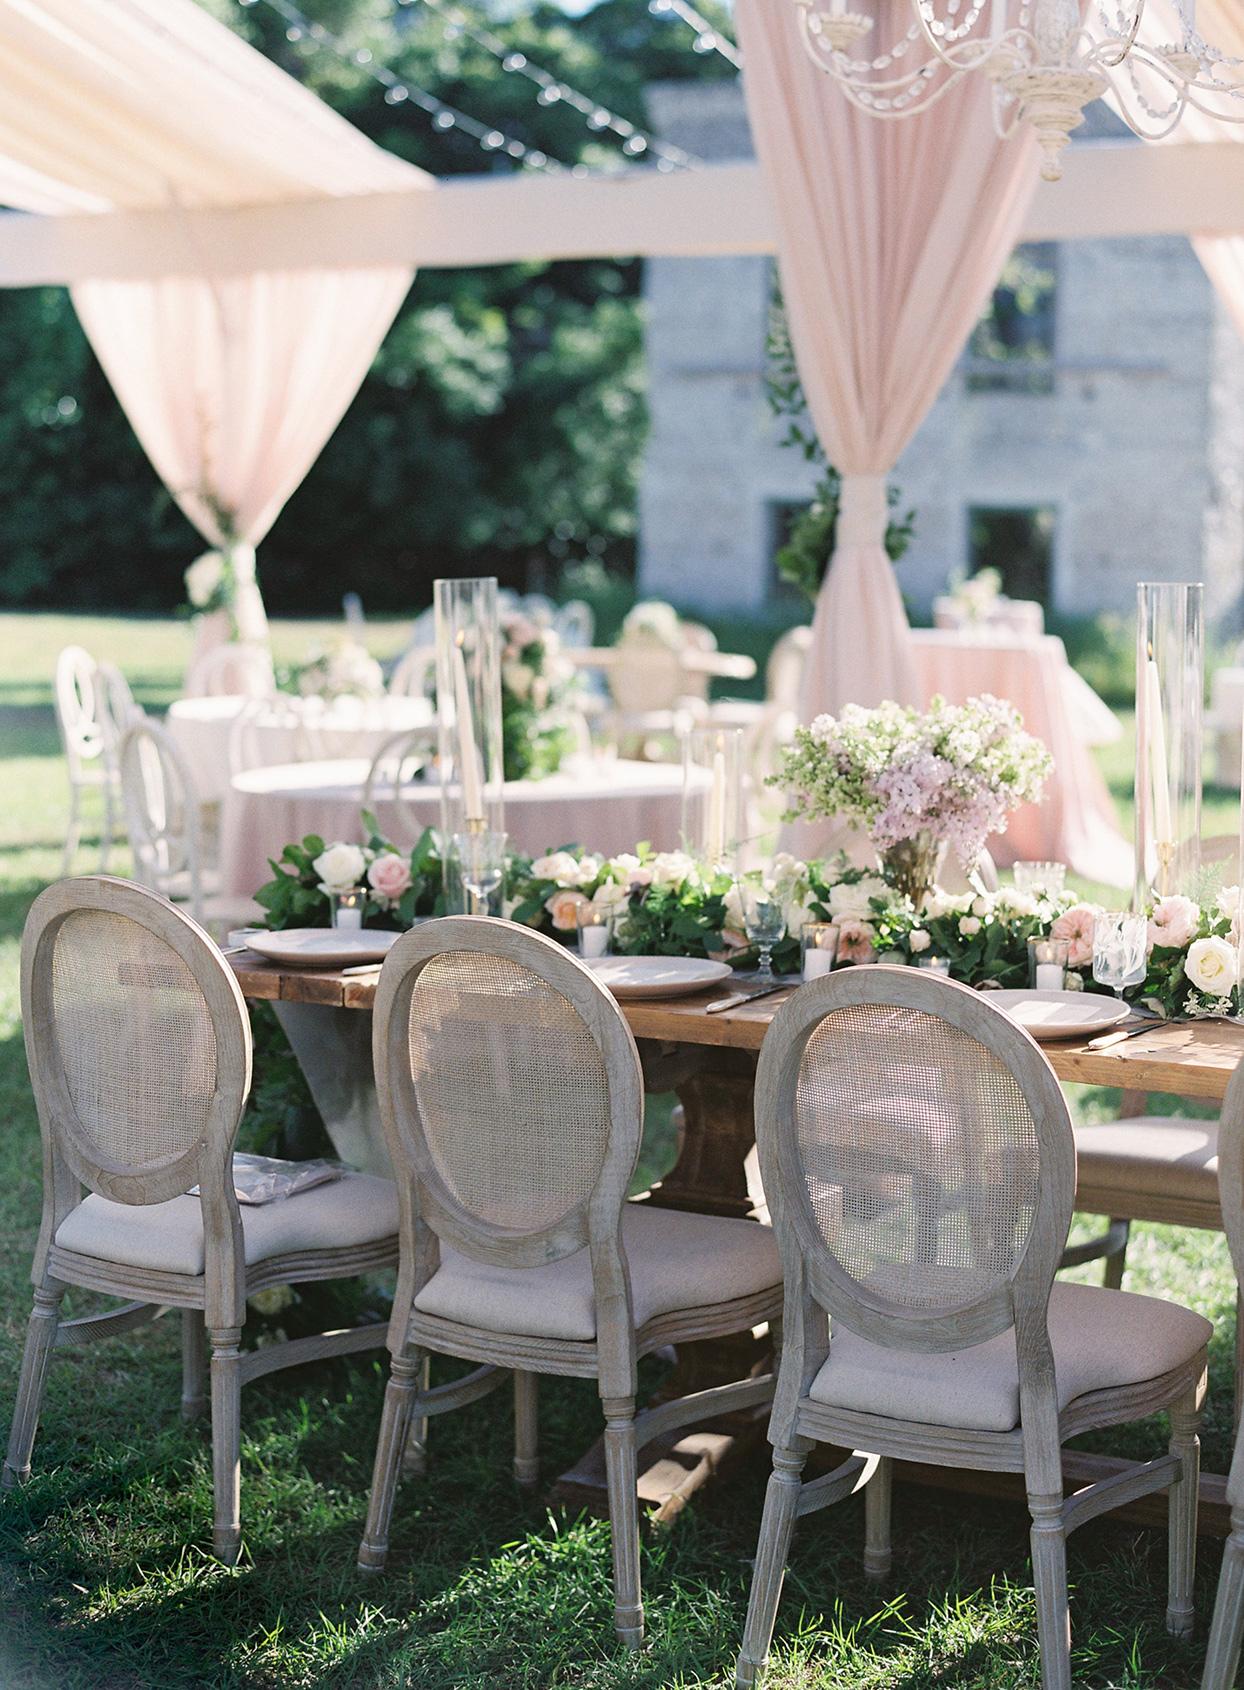 chelsea john wedding reception tables until pastel pink tent